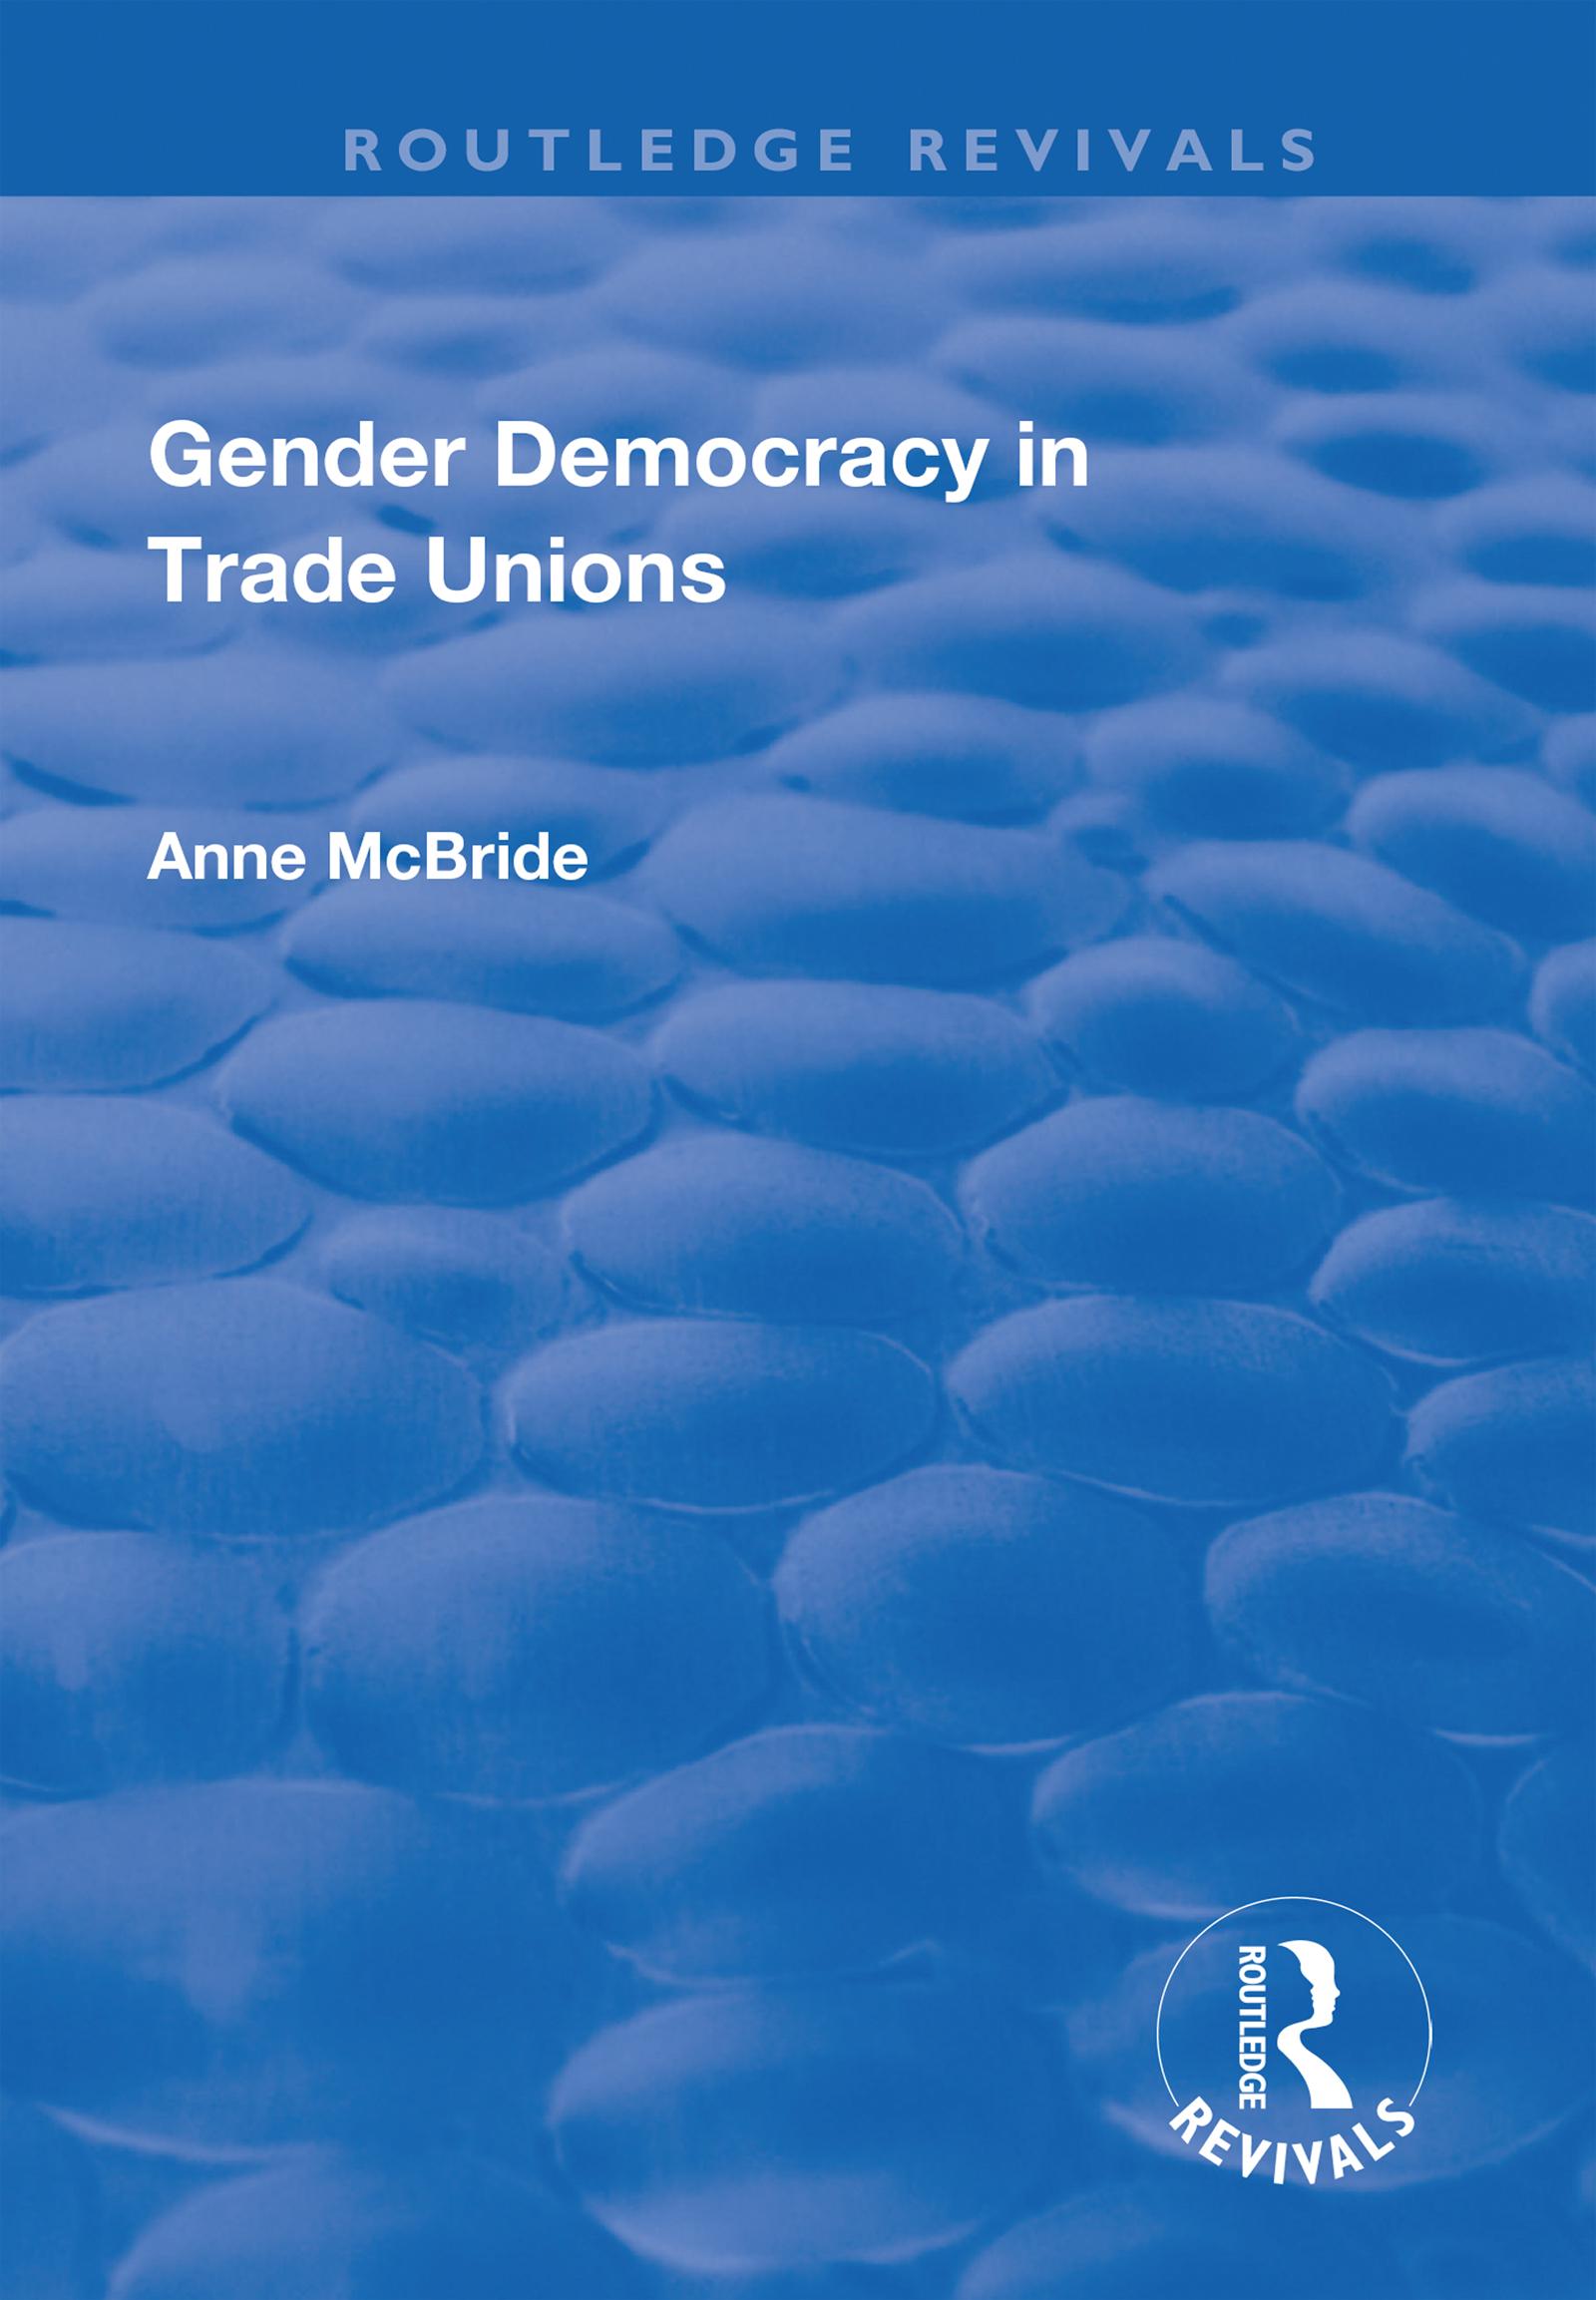 Gender Democracy in Trade Unions